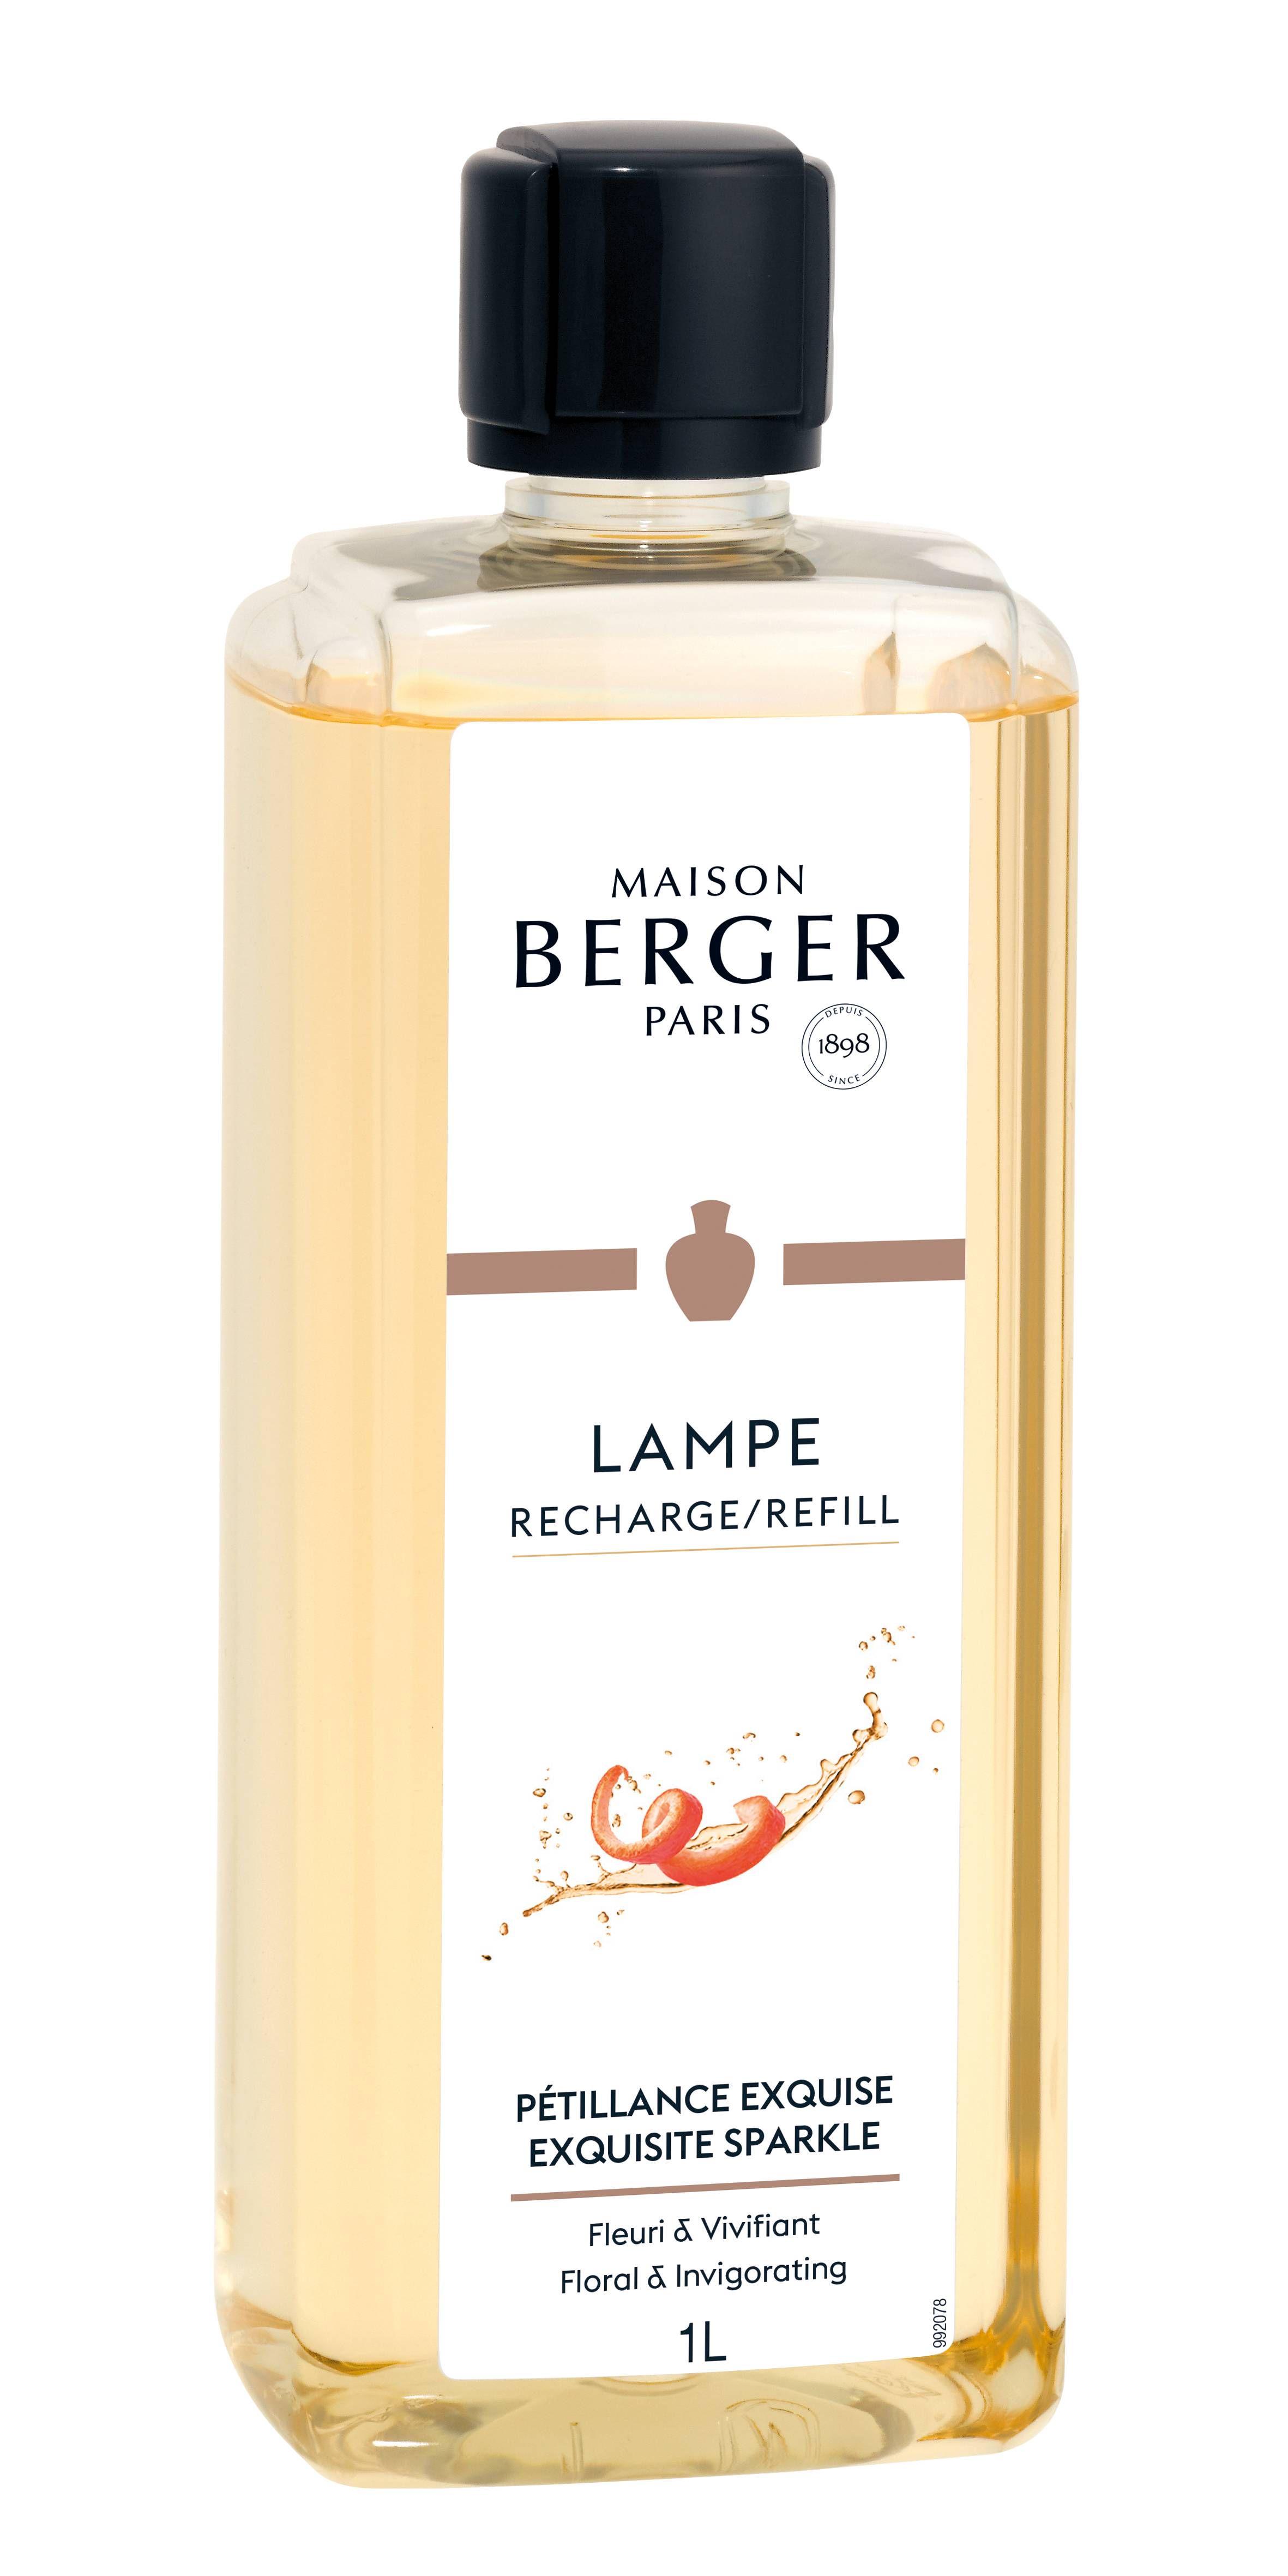 lampe-berger-navulling-1liter-exquisite-sparkle